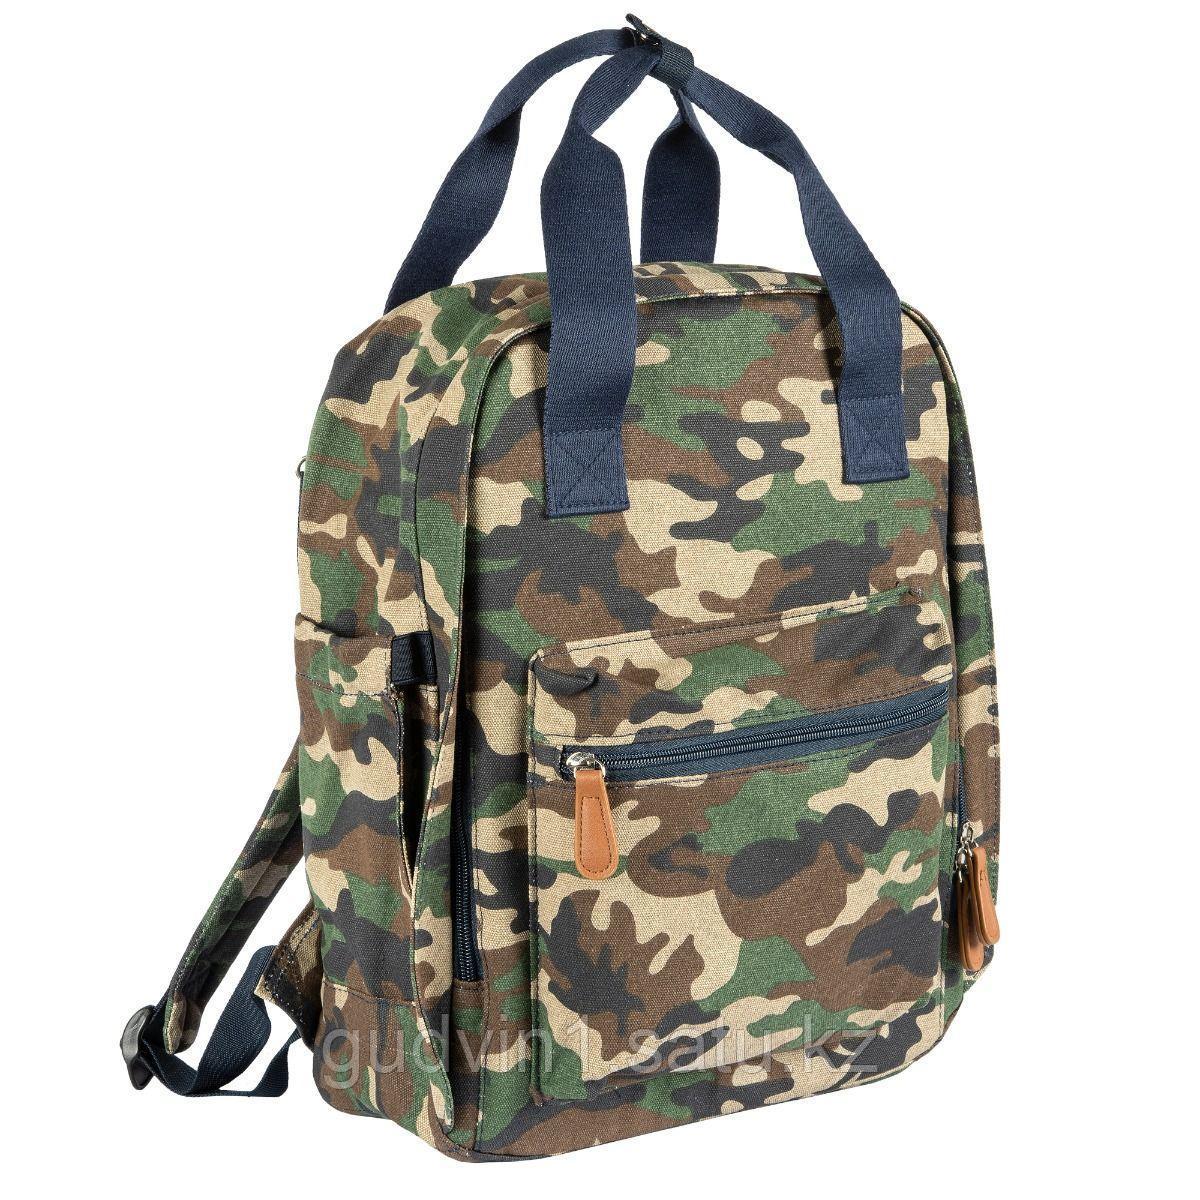 Chicco: Сумка-рюкзак для мамы хаки 1160007